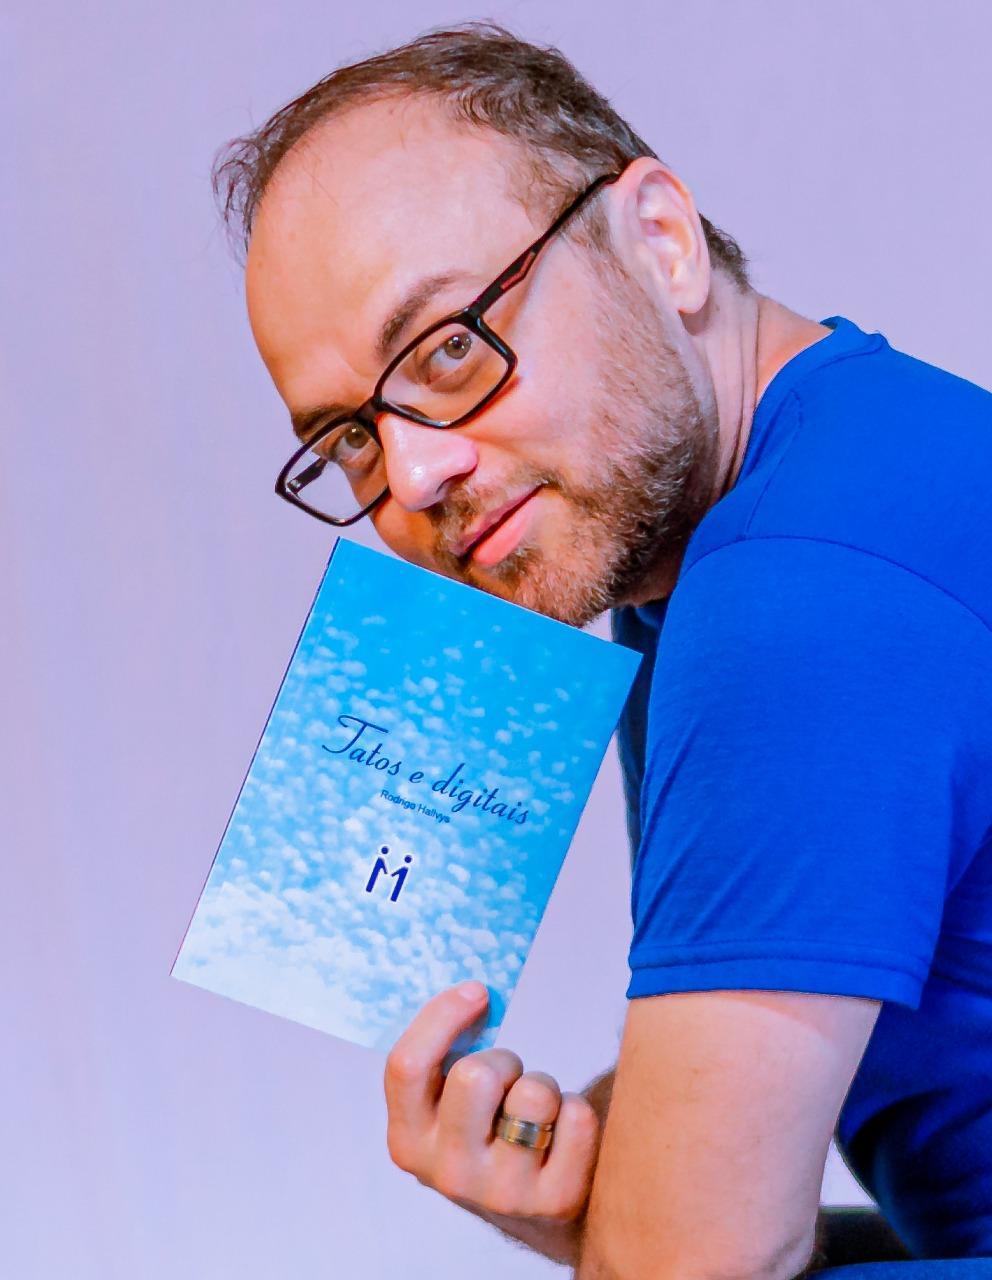 Ator Rodrigo Hallvys, de Volta Redonda, é capa da revista americana